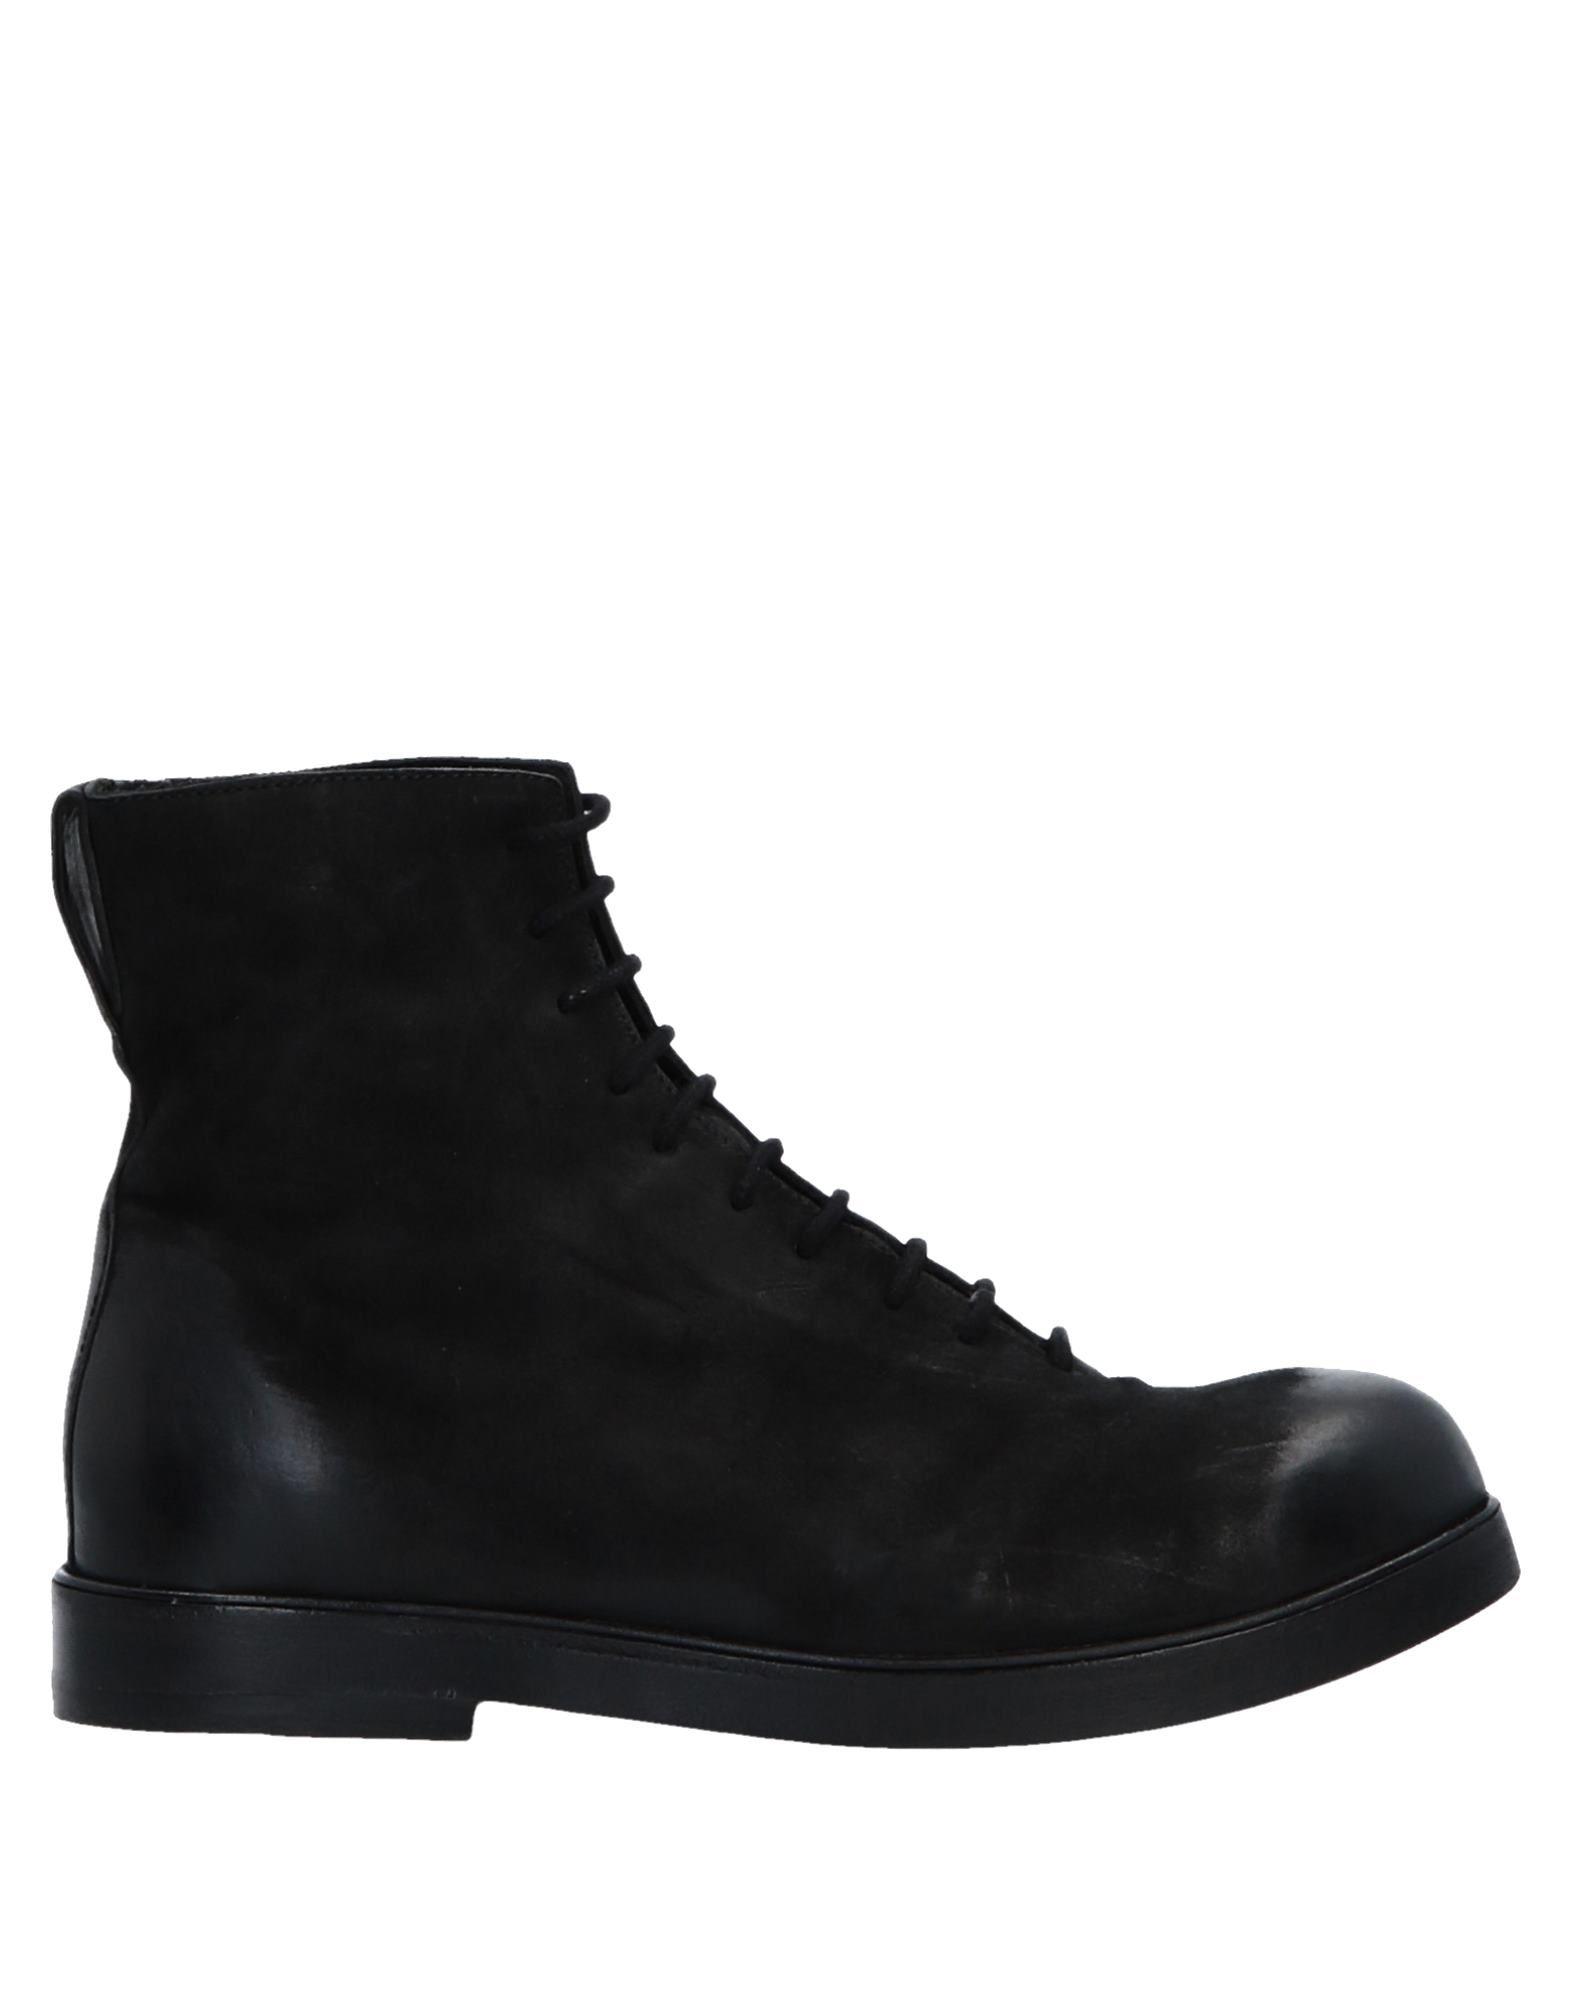 Rabatt Schuhe The Last Conspiracy Stiefelette Damen  11519730IV